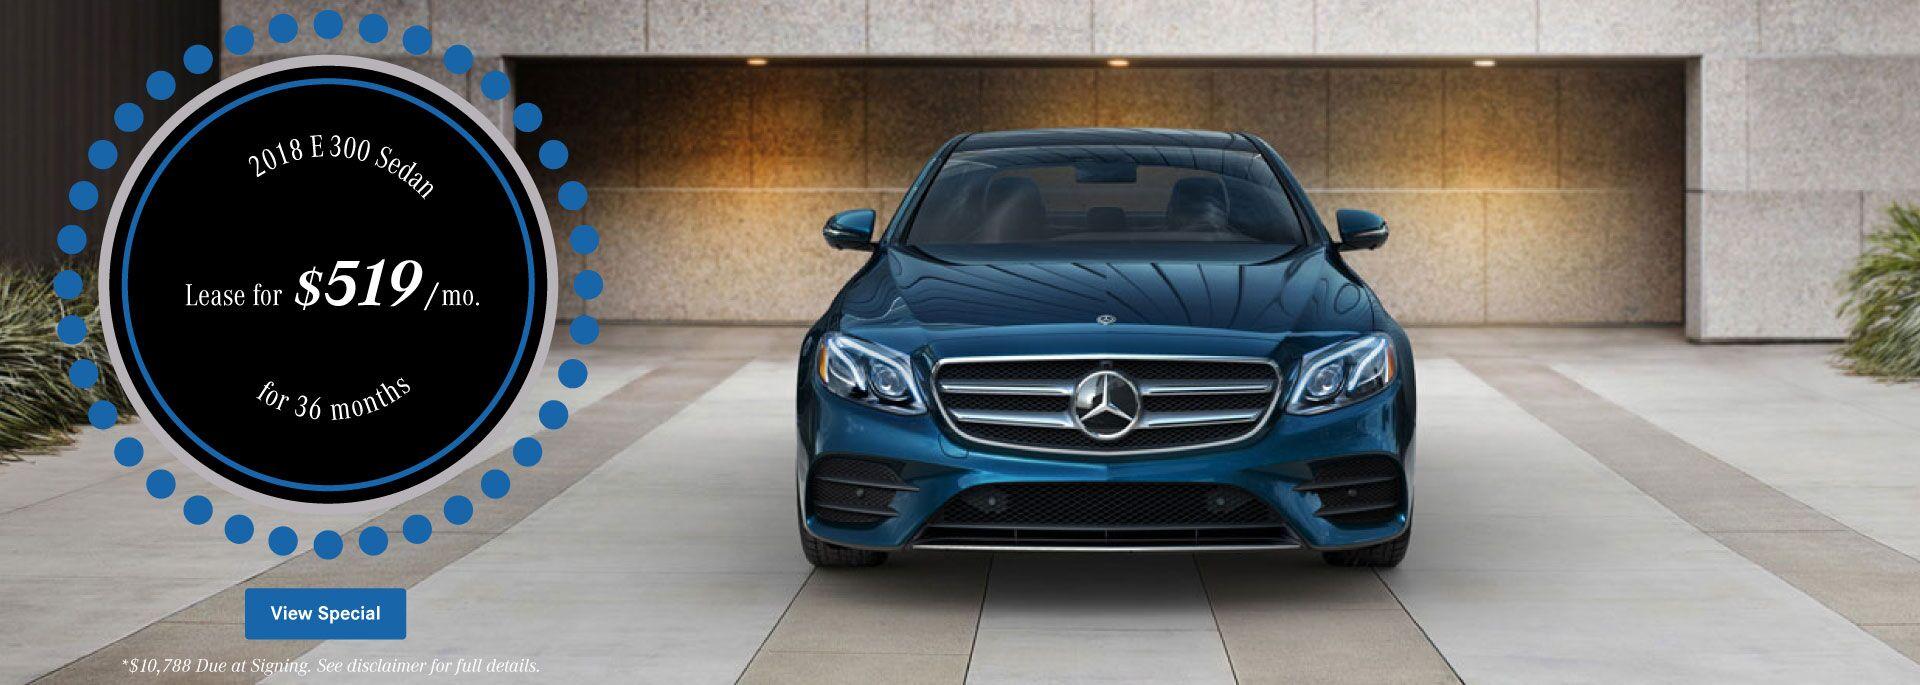 MercedesBenz Of El Paso Tx Luxury Car Dealership MB El Paso - Mercedes benz texas dealerships